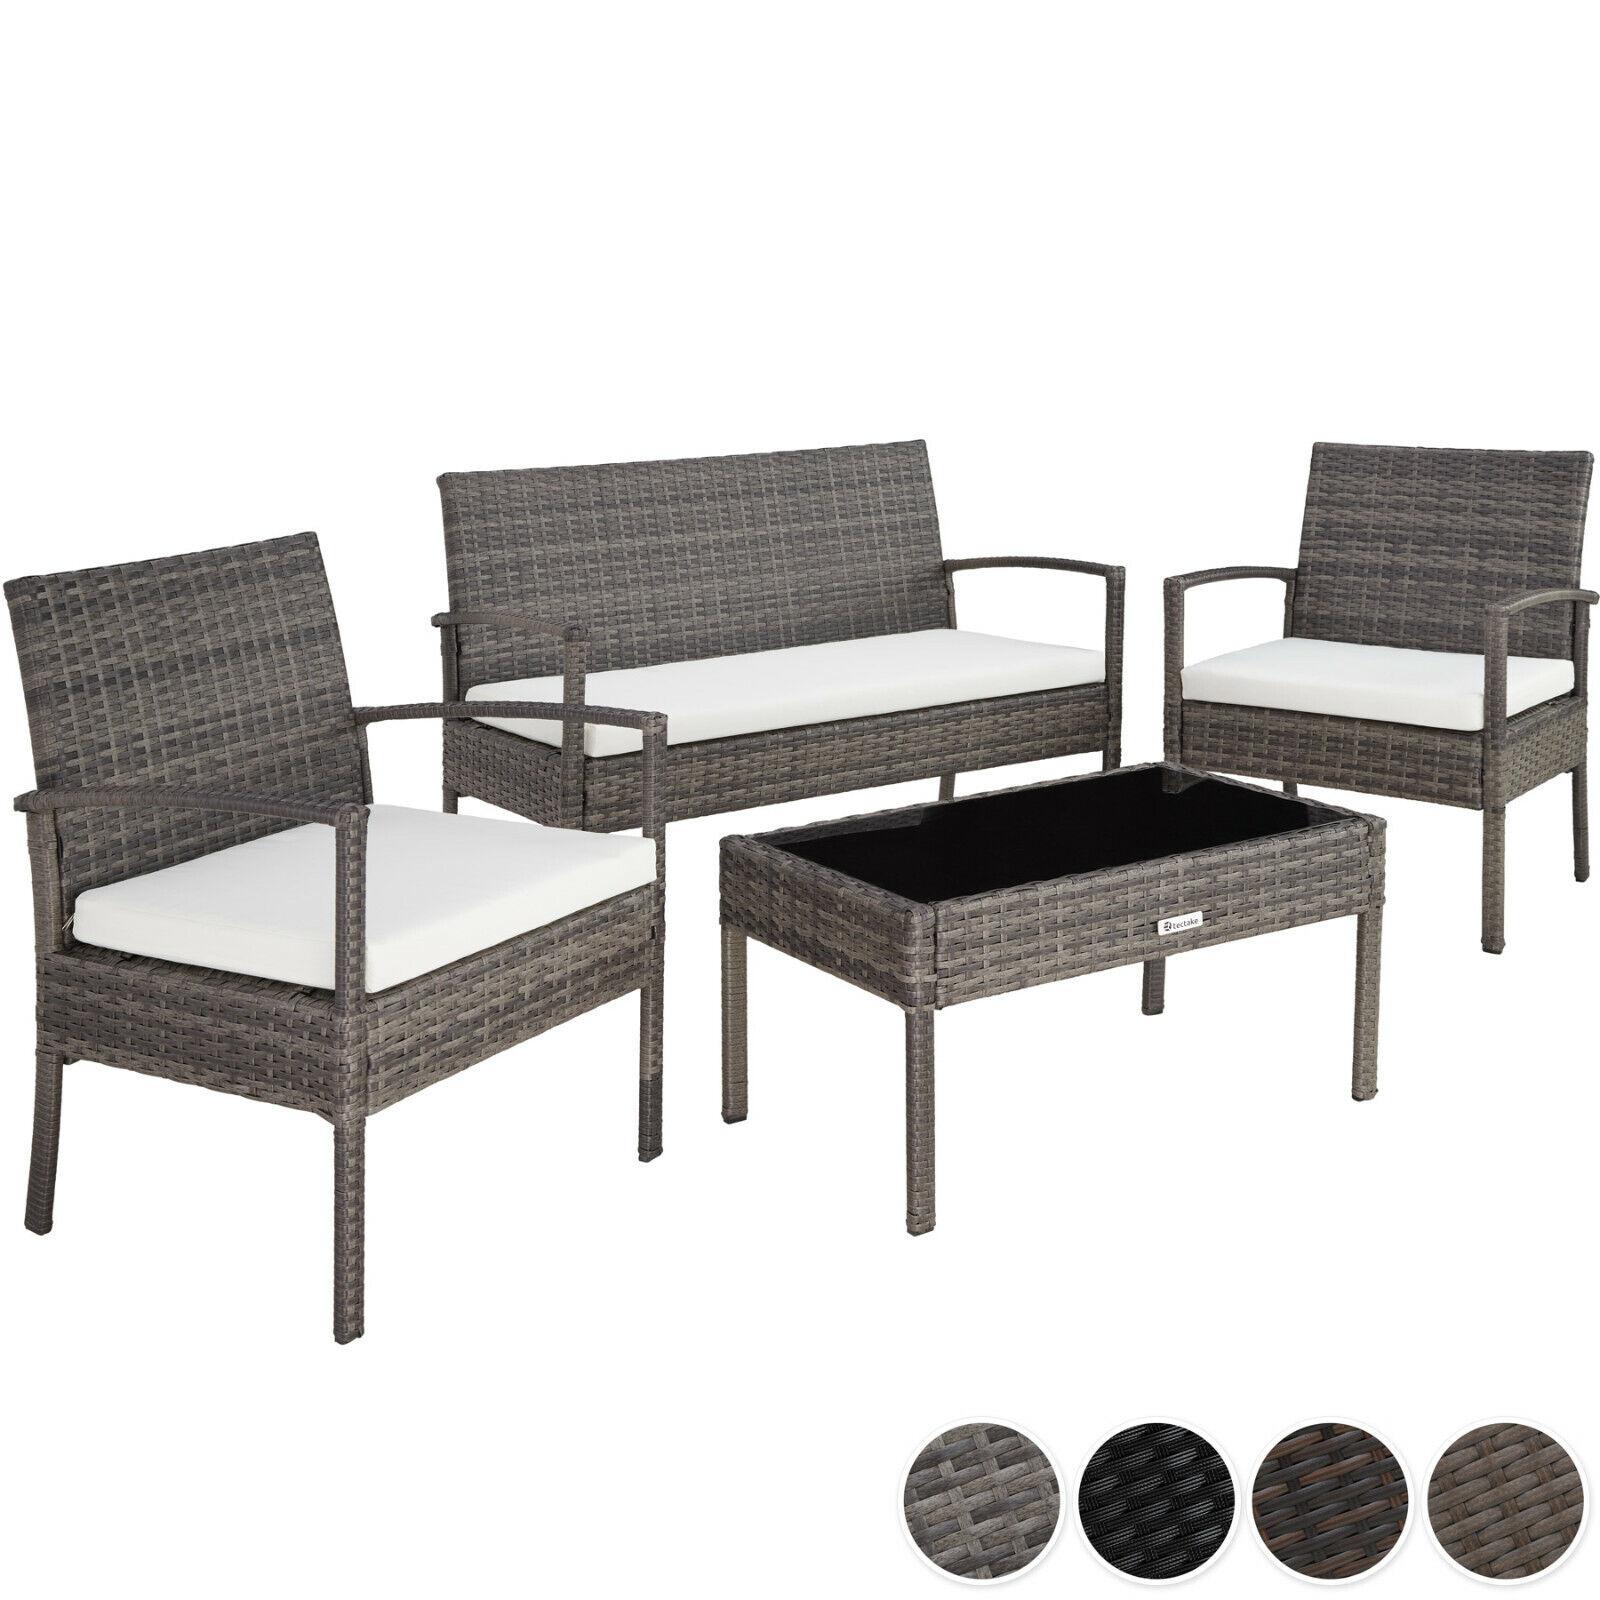 Garden Furniture - Poly Rattan Garden Furniture 2 Chairs Bench Table Set Outdoor Patio Wicker Grey